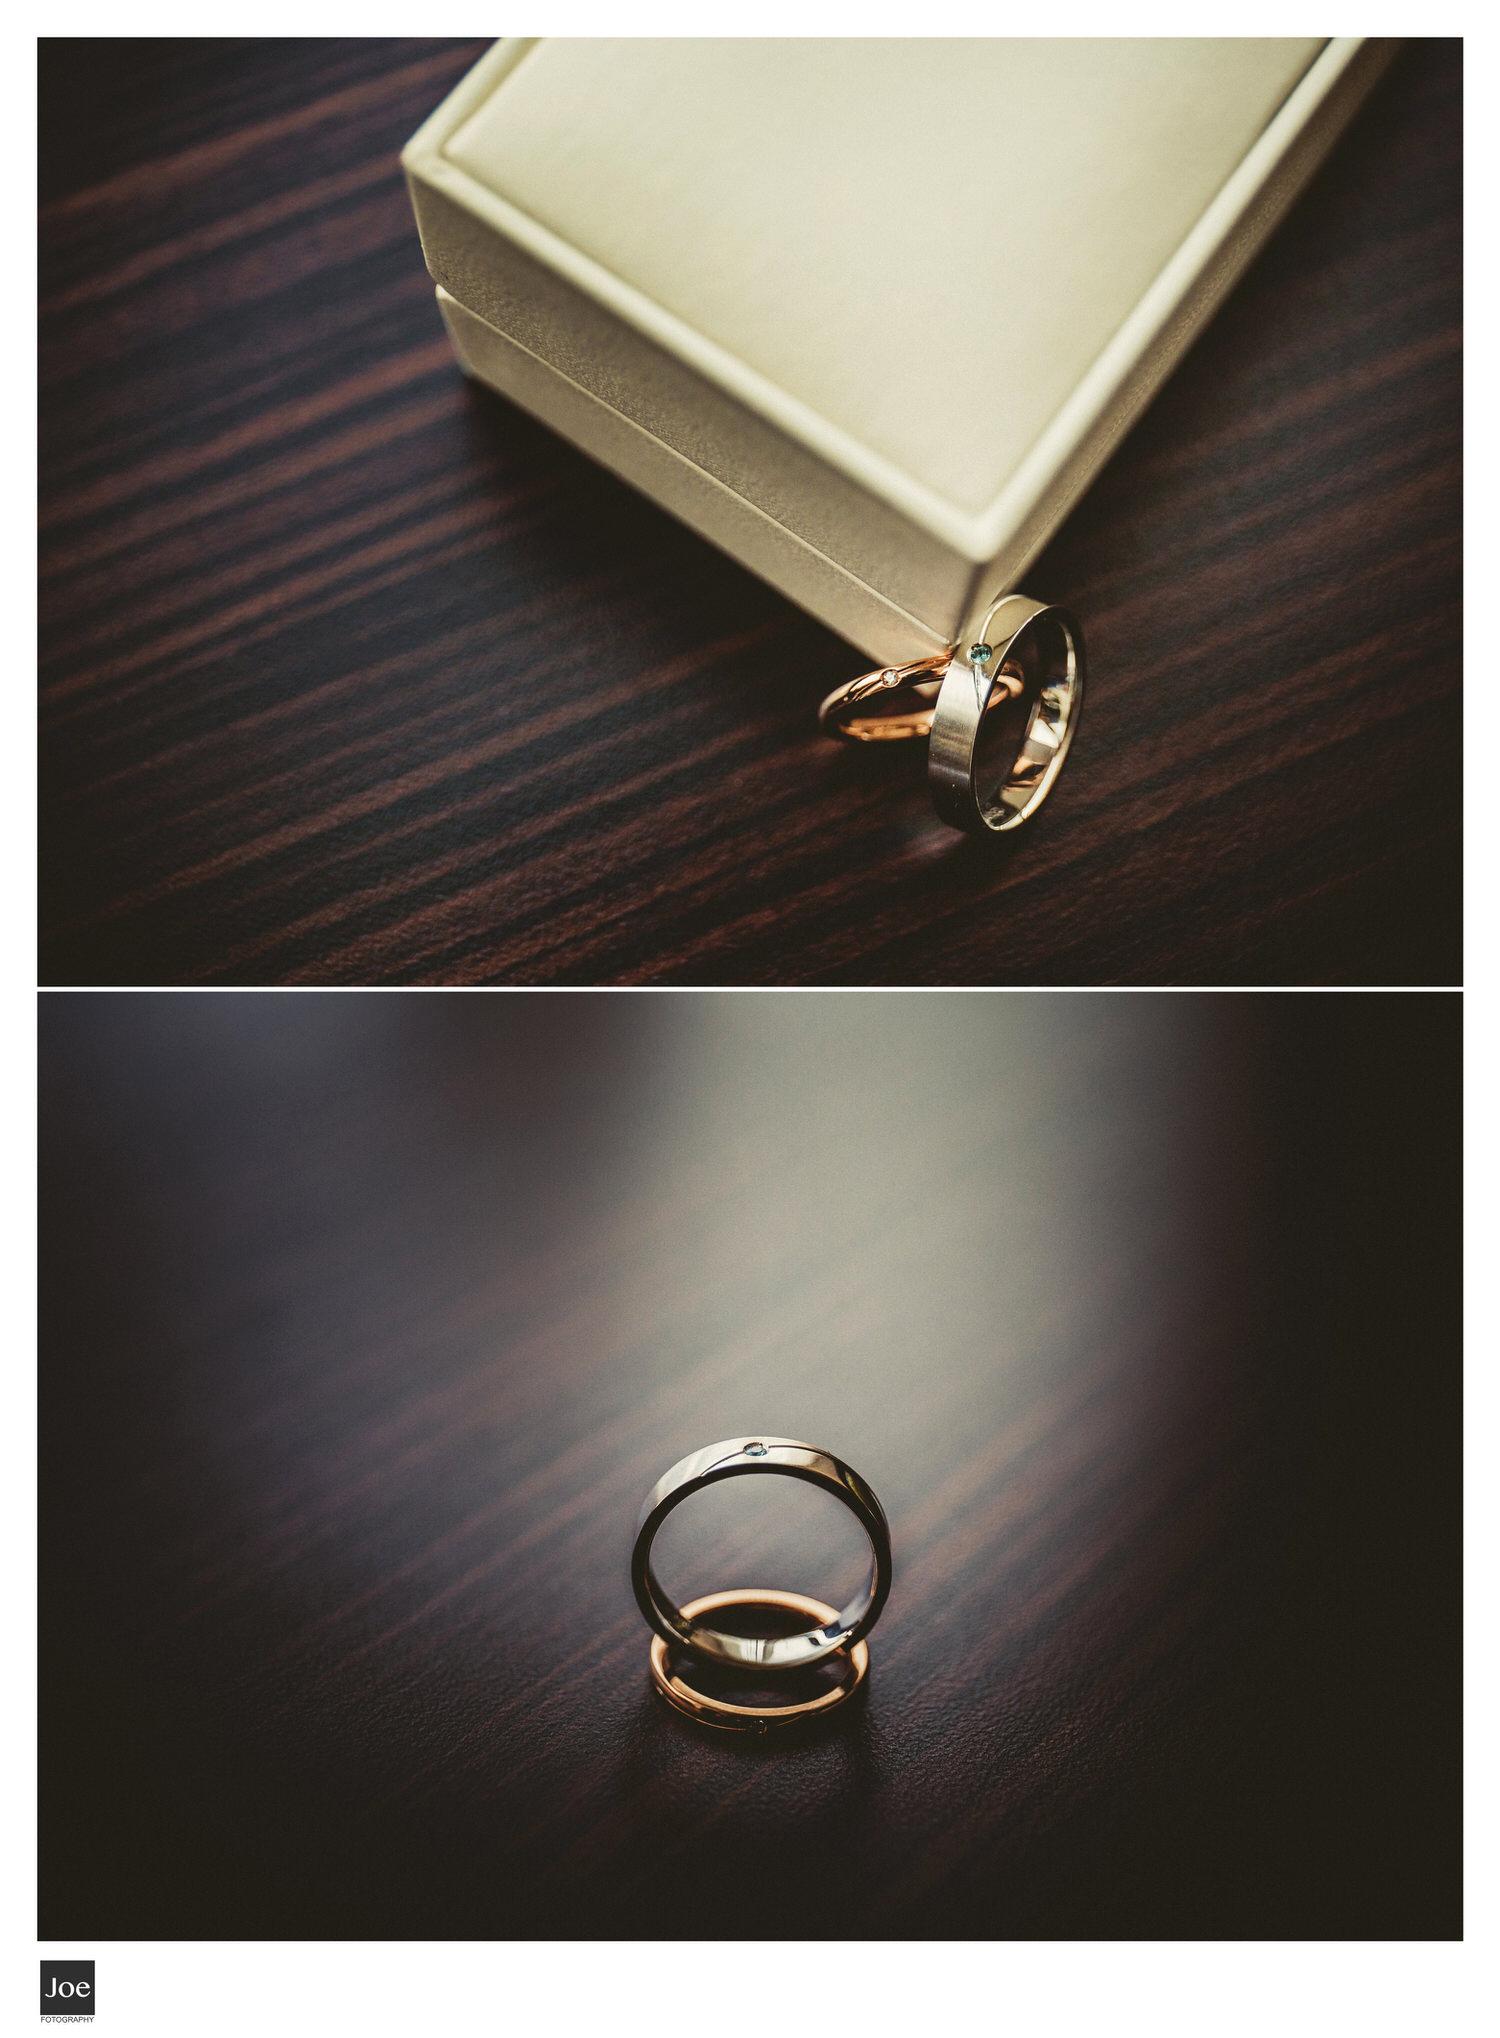 90-the-ring-kyoto-pre-wedding-angela-danny-joe-fotography.jpg